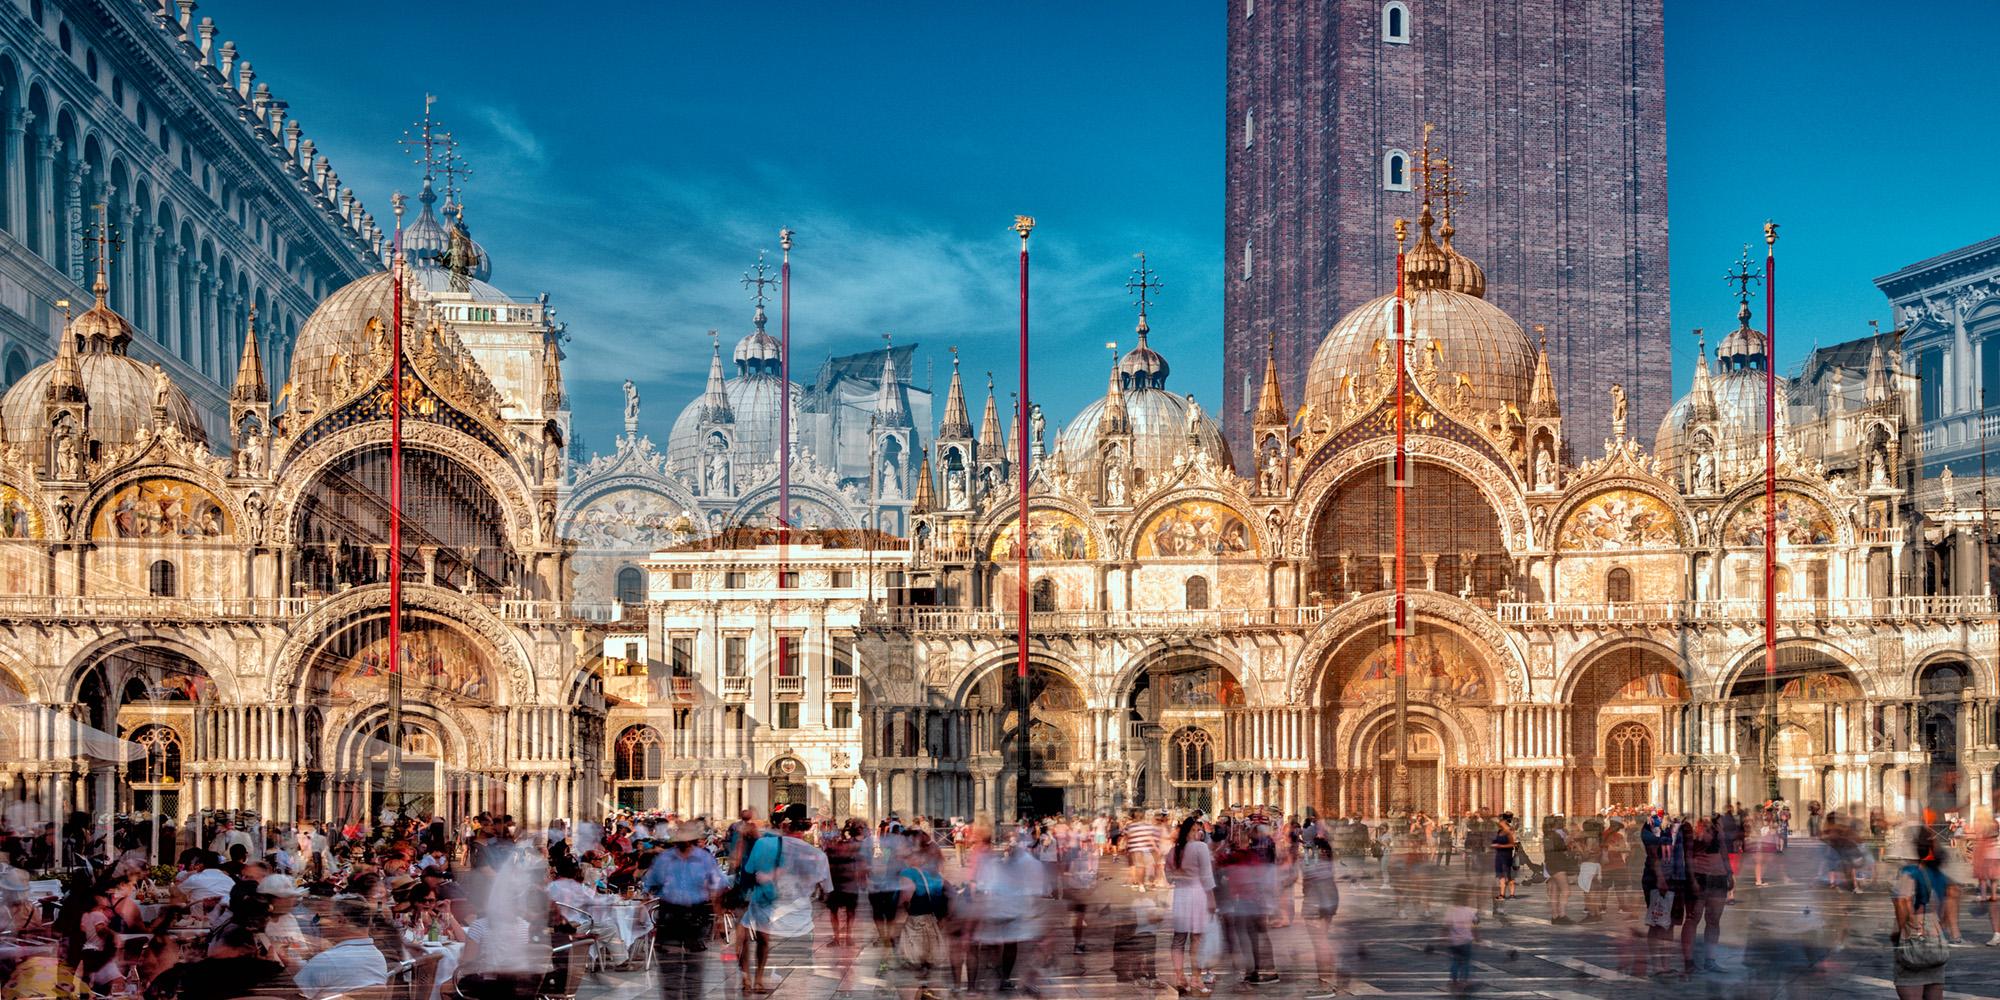 Nicolas Ruel Photographer - Cityscape - Venice